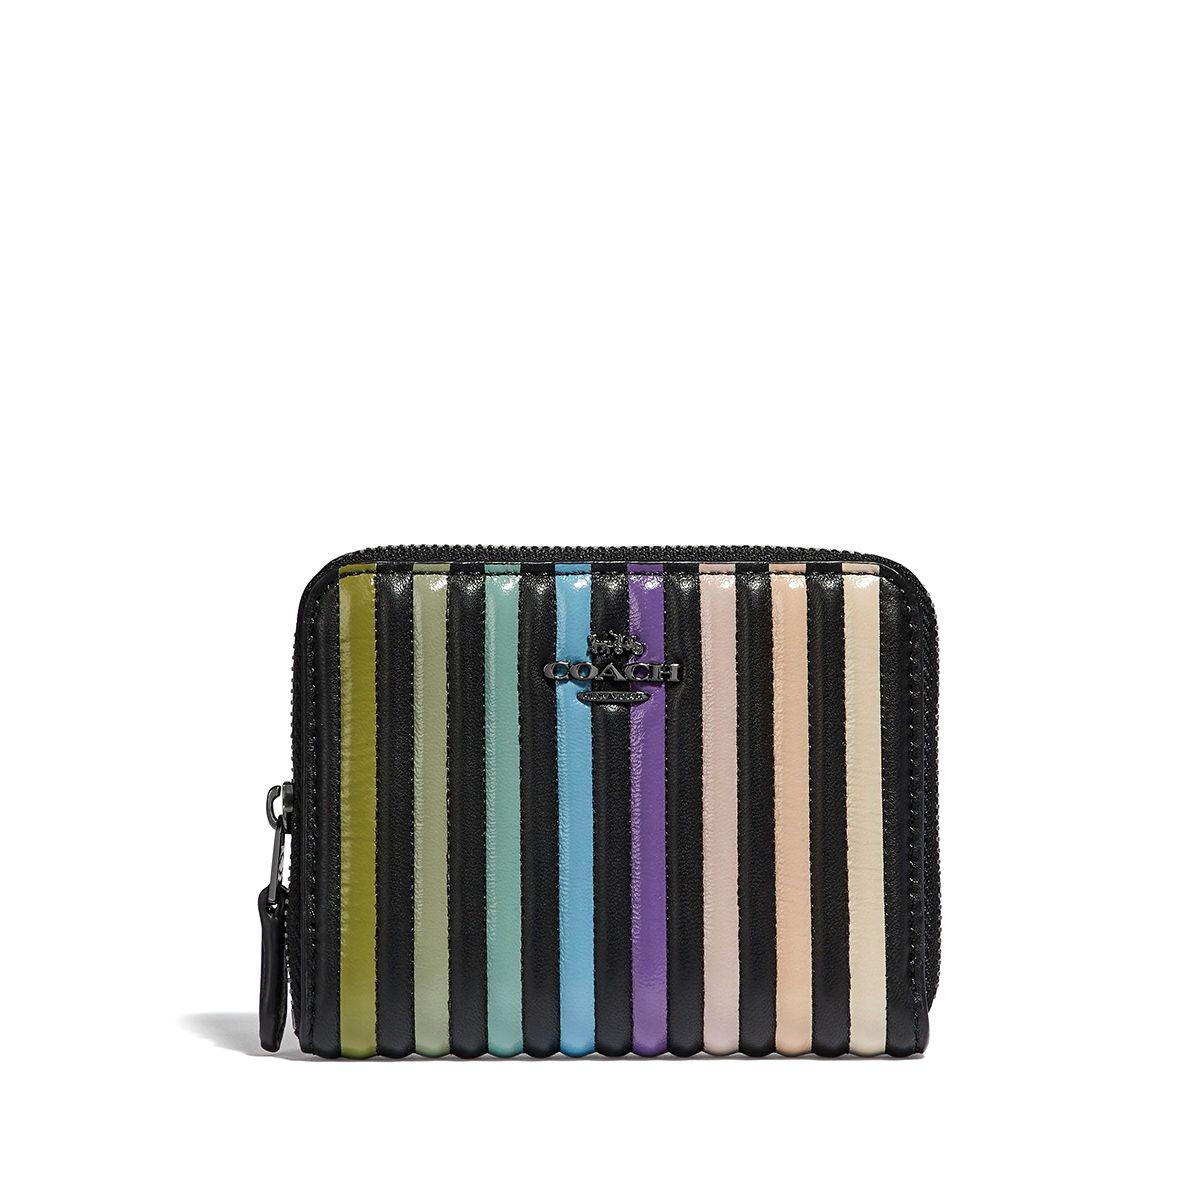 COACH - Designer Handbags   Accessories - Macy s 5572e7a26f8